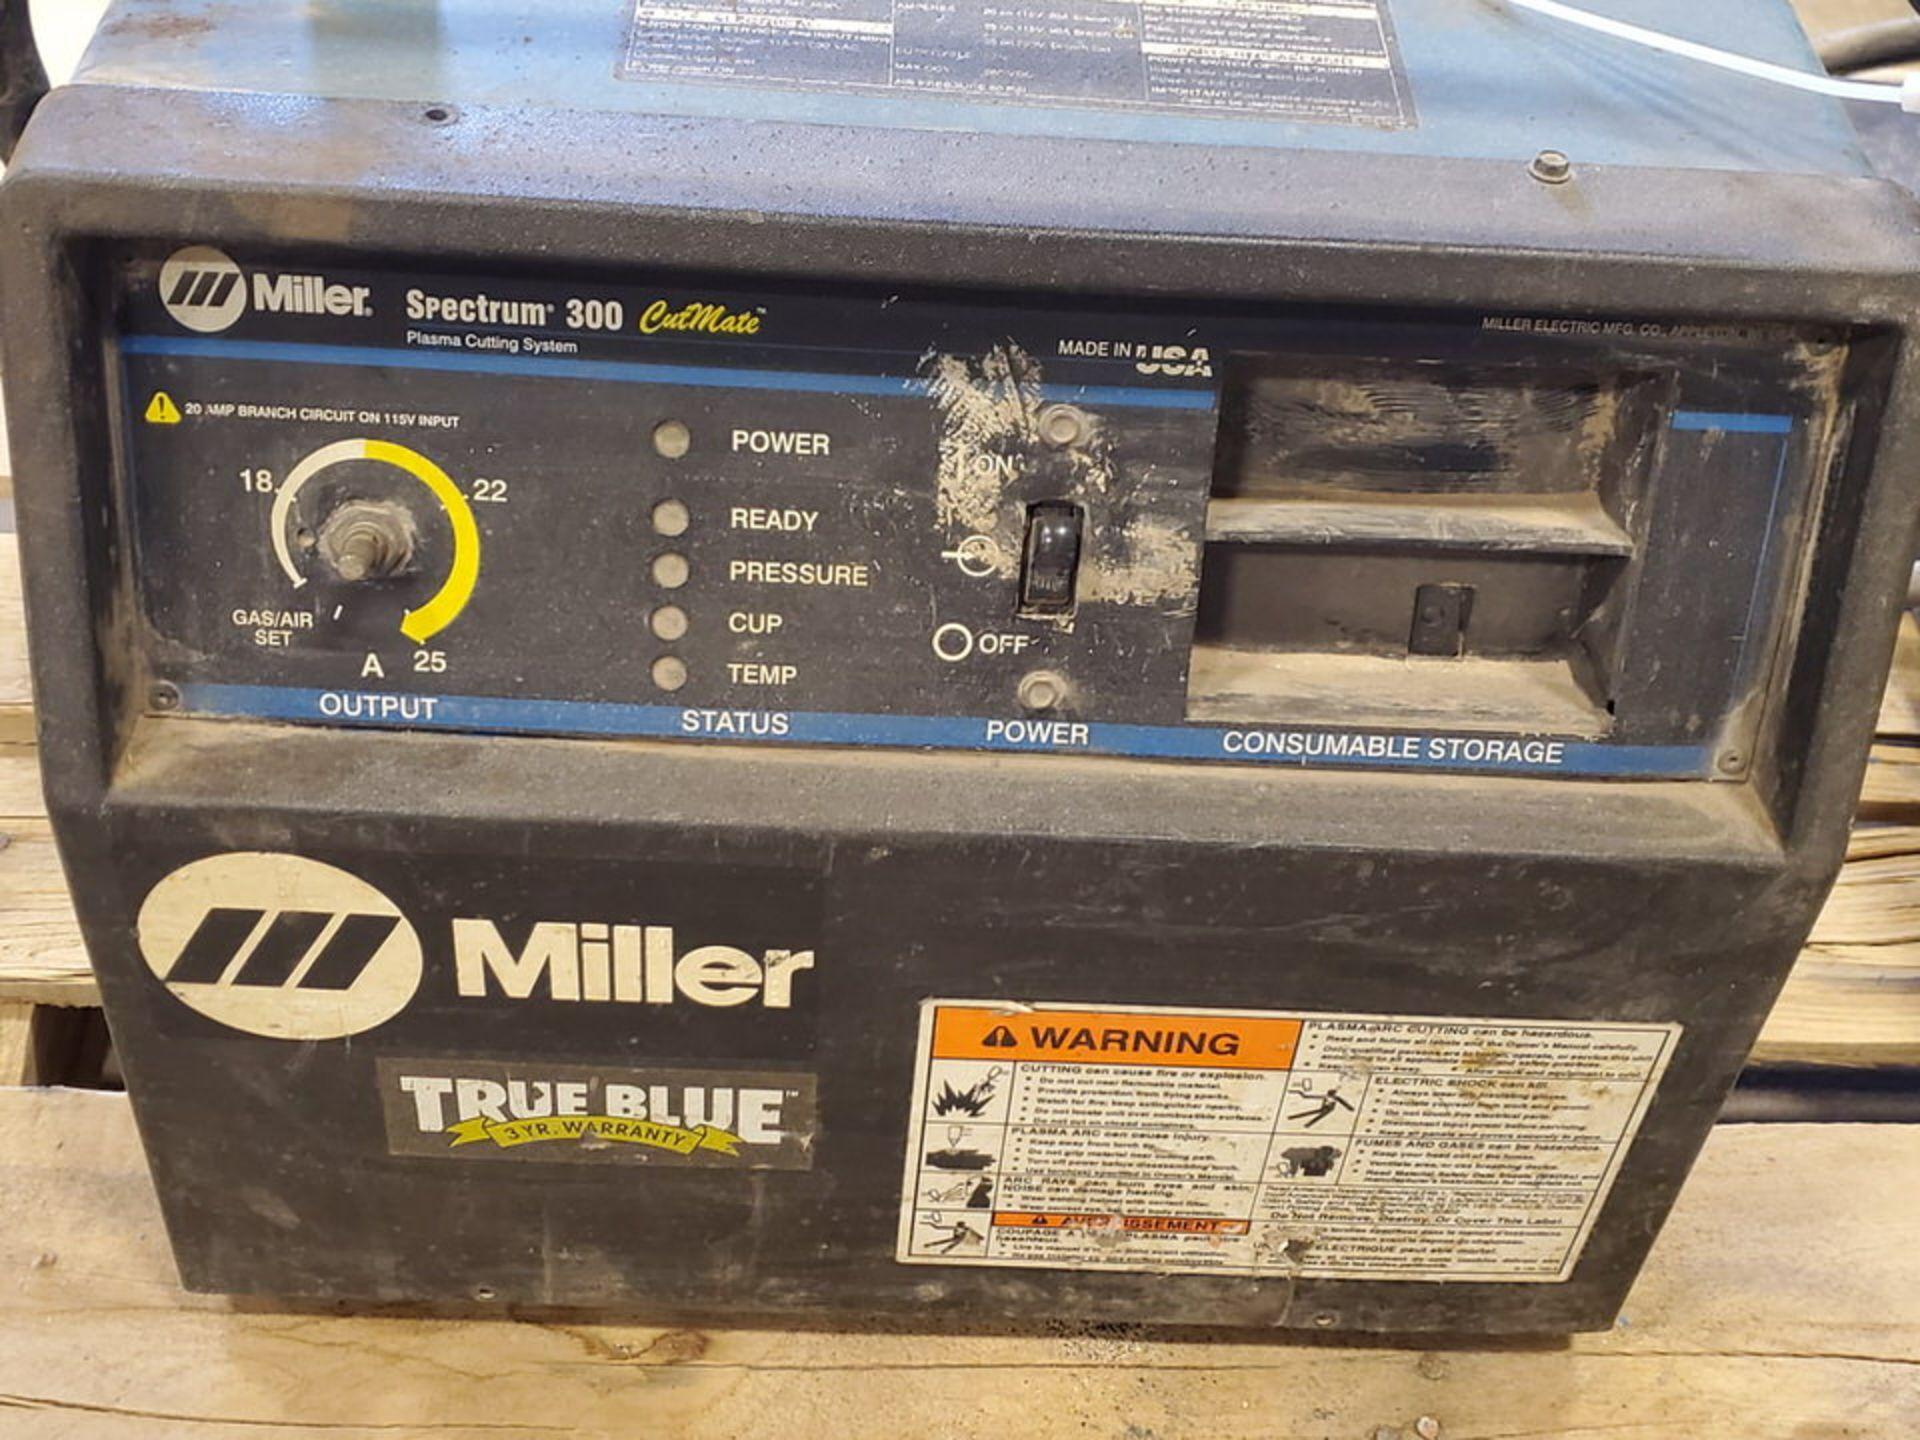 Miller Spectrum 300 Plasma Cutter 115/230V, 26/17A, 1PH, 60HZ; W/ 70 Series 24V Wire Feeder, 10A, - Image 5 of 8